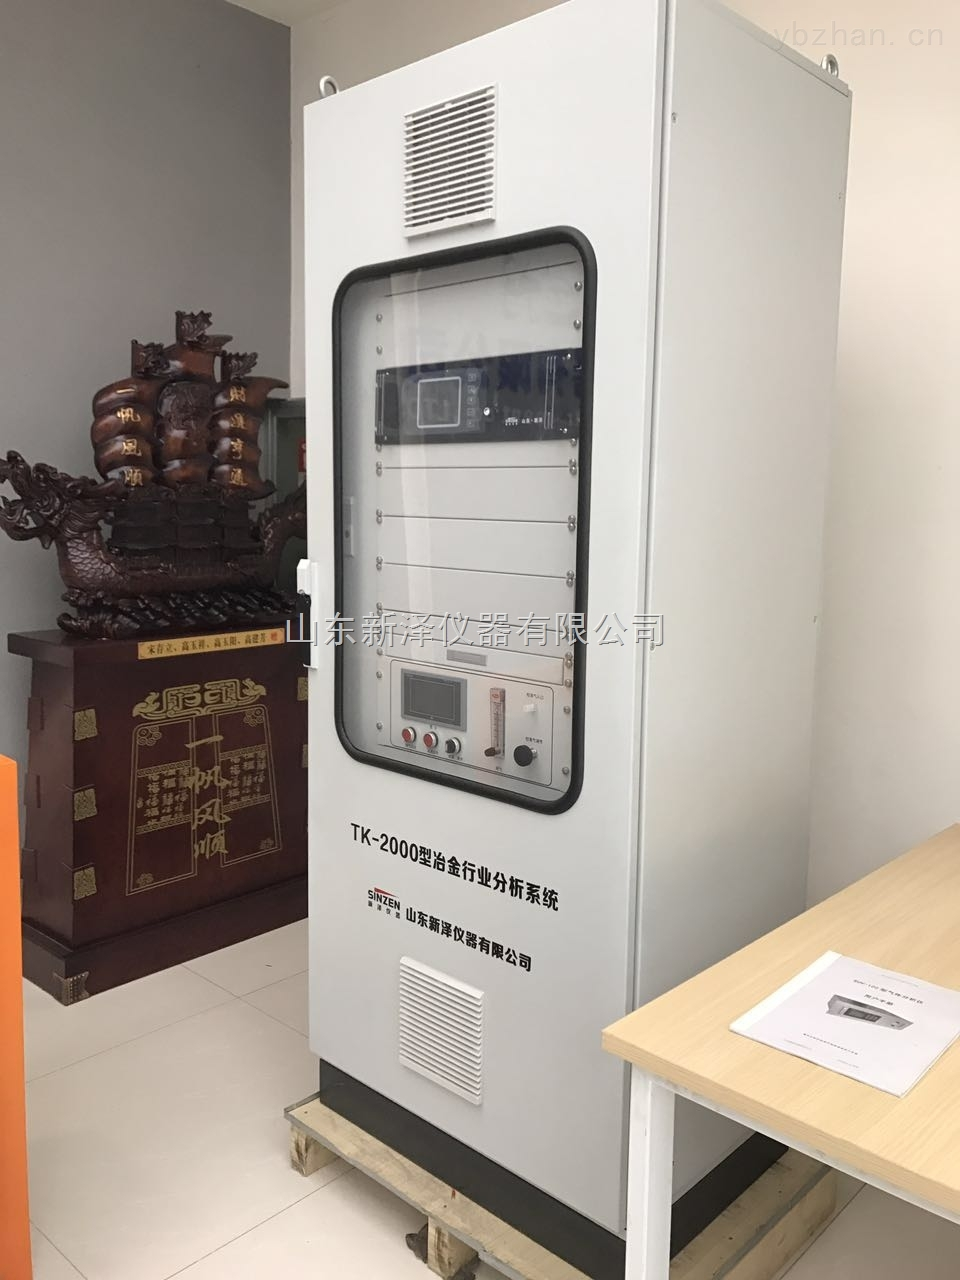 TK-1000-磚廠煙氣在線監測系統